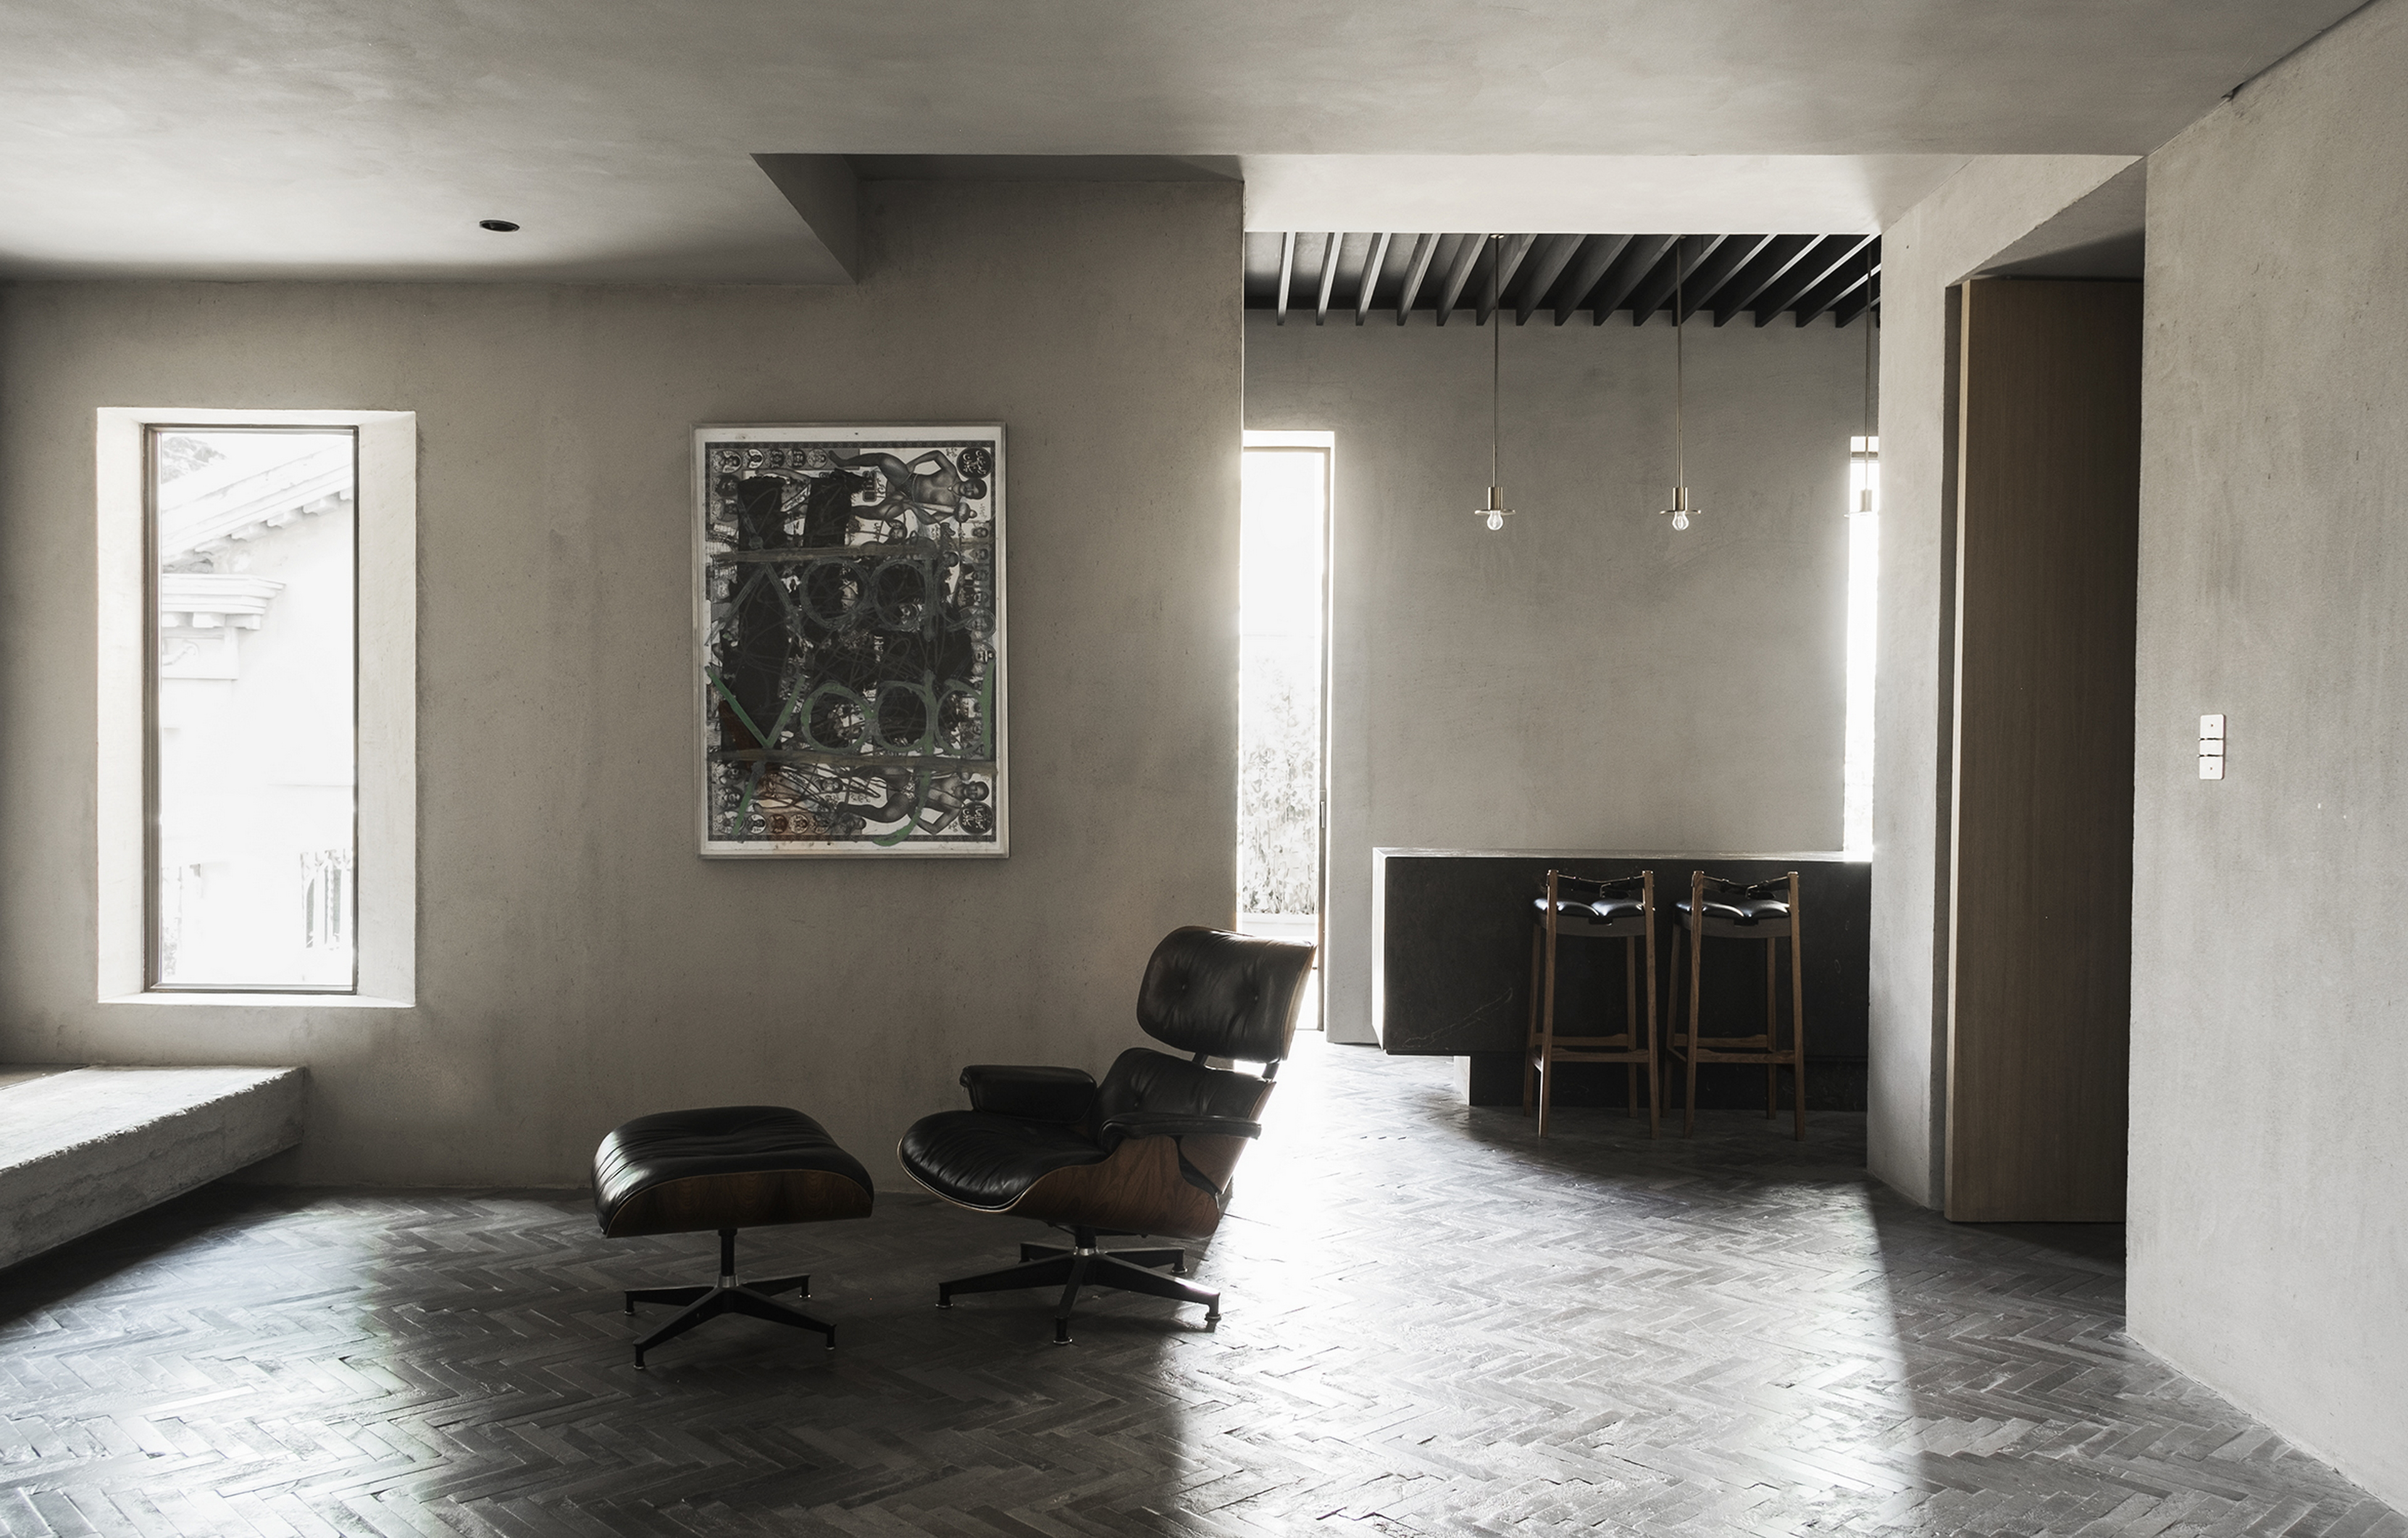 Domus Ru apartment in Rome by MORQ, made with MultiTerra Wabi Sale Grigio, photo by Giulio Aristide